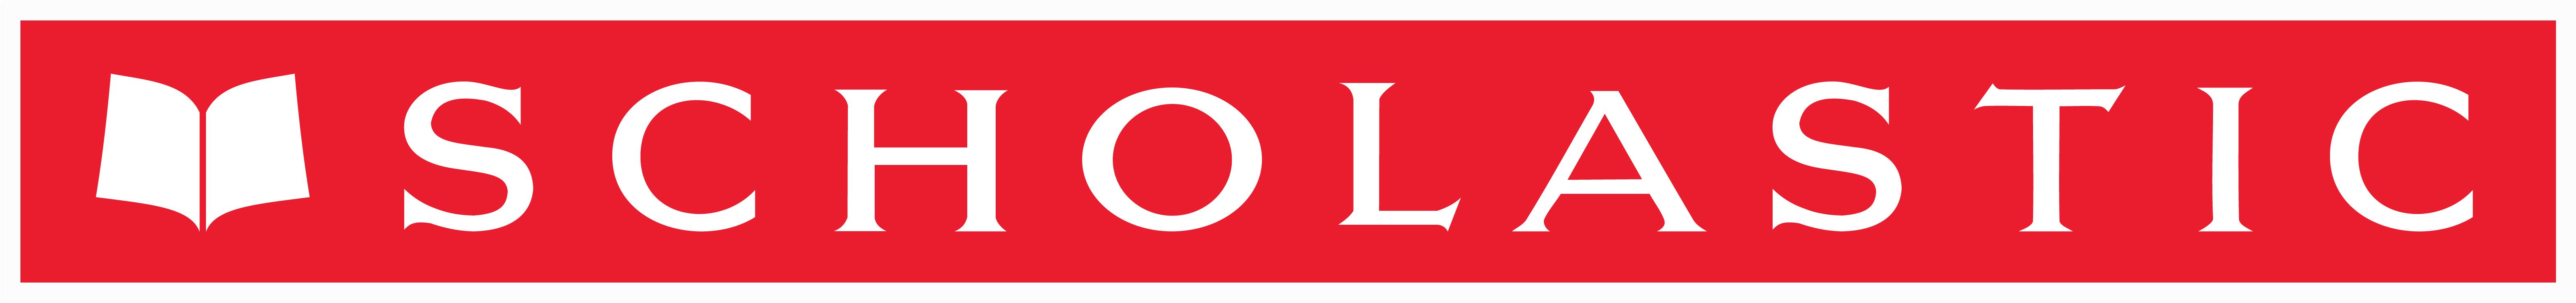 Scholastic Logos